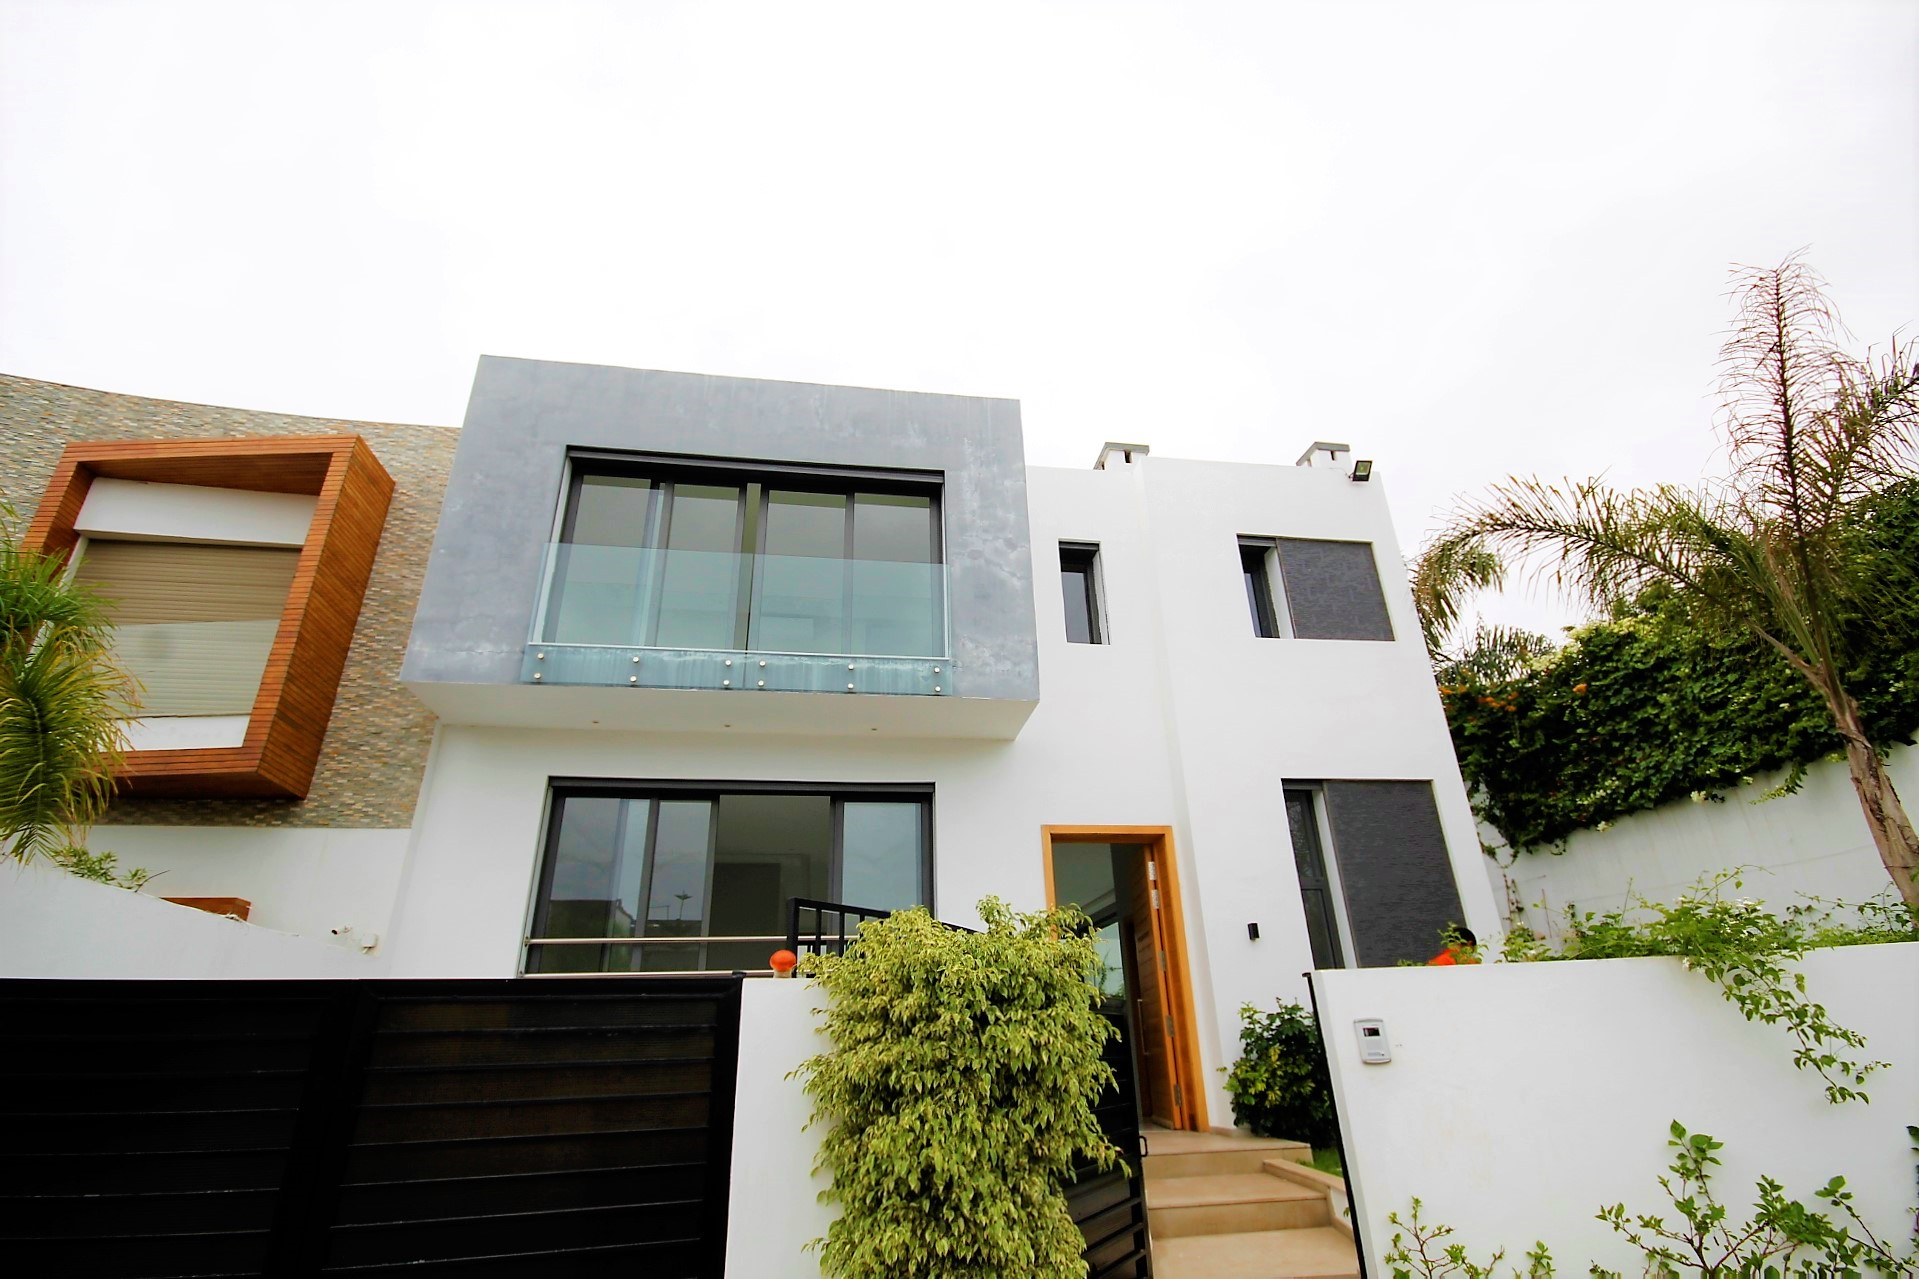 Maroc, Casablanca, Ain Diab,loue villa 4 suites +ascenseur+piscine